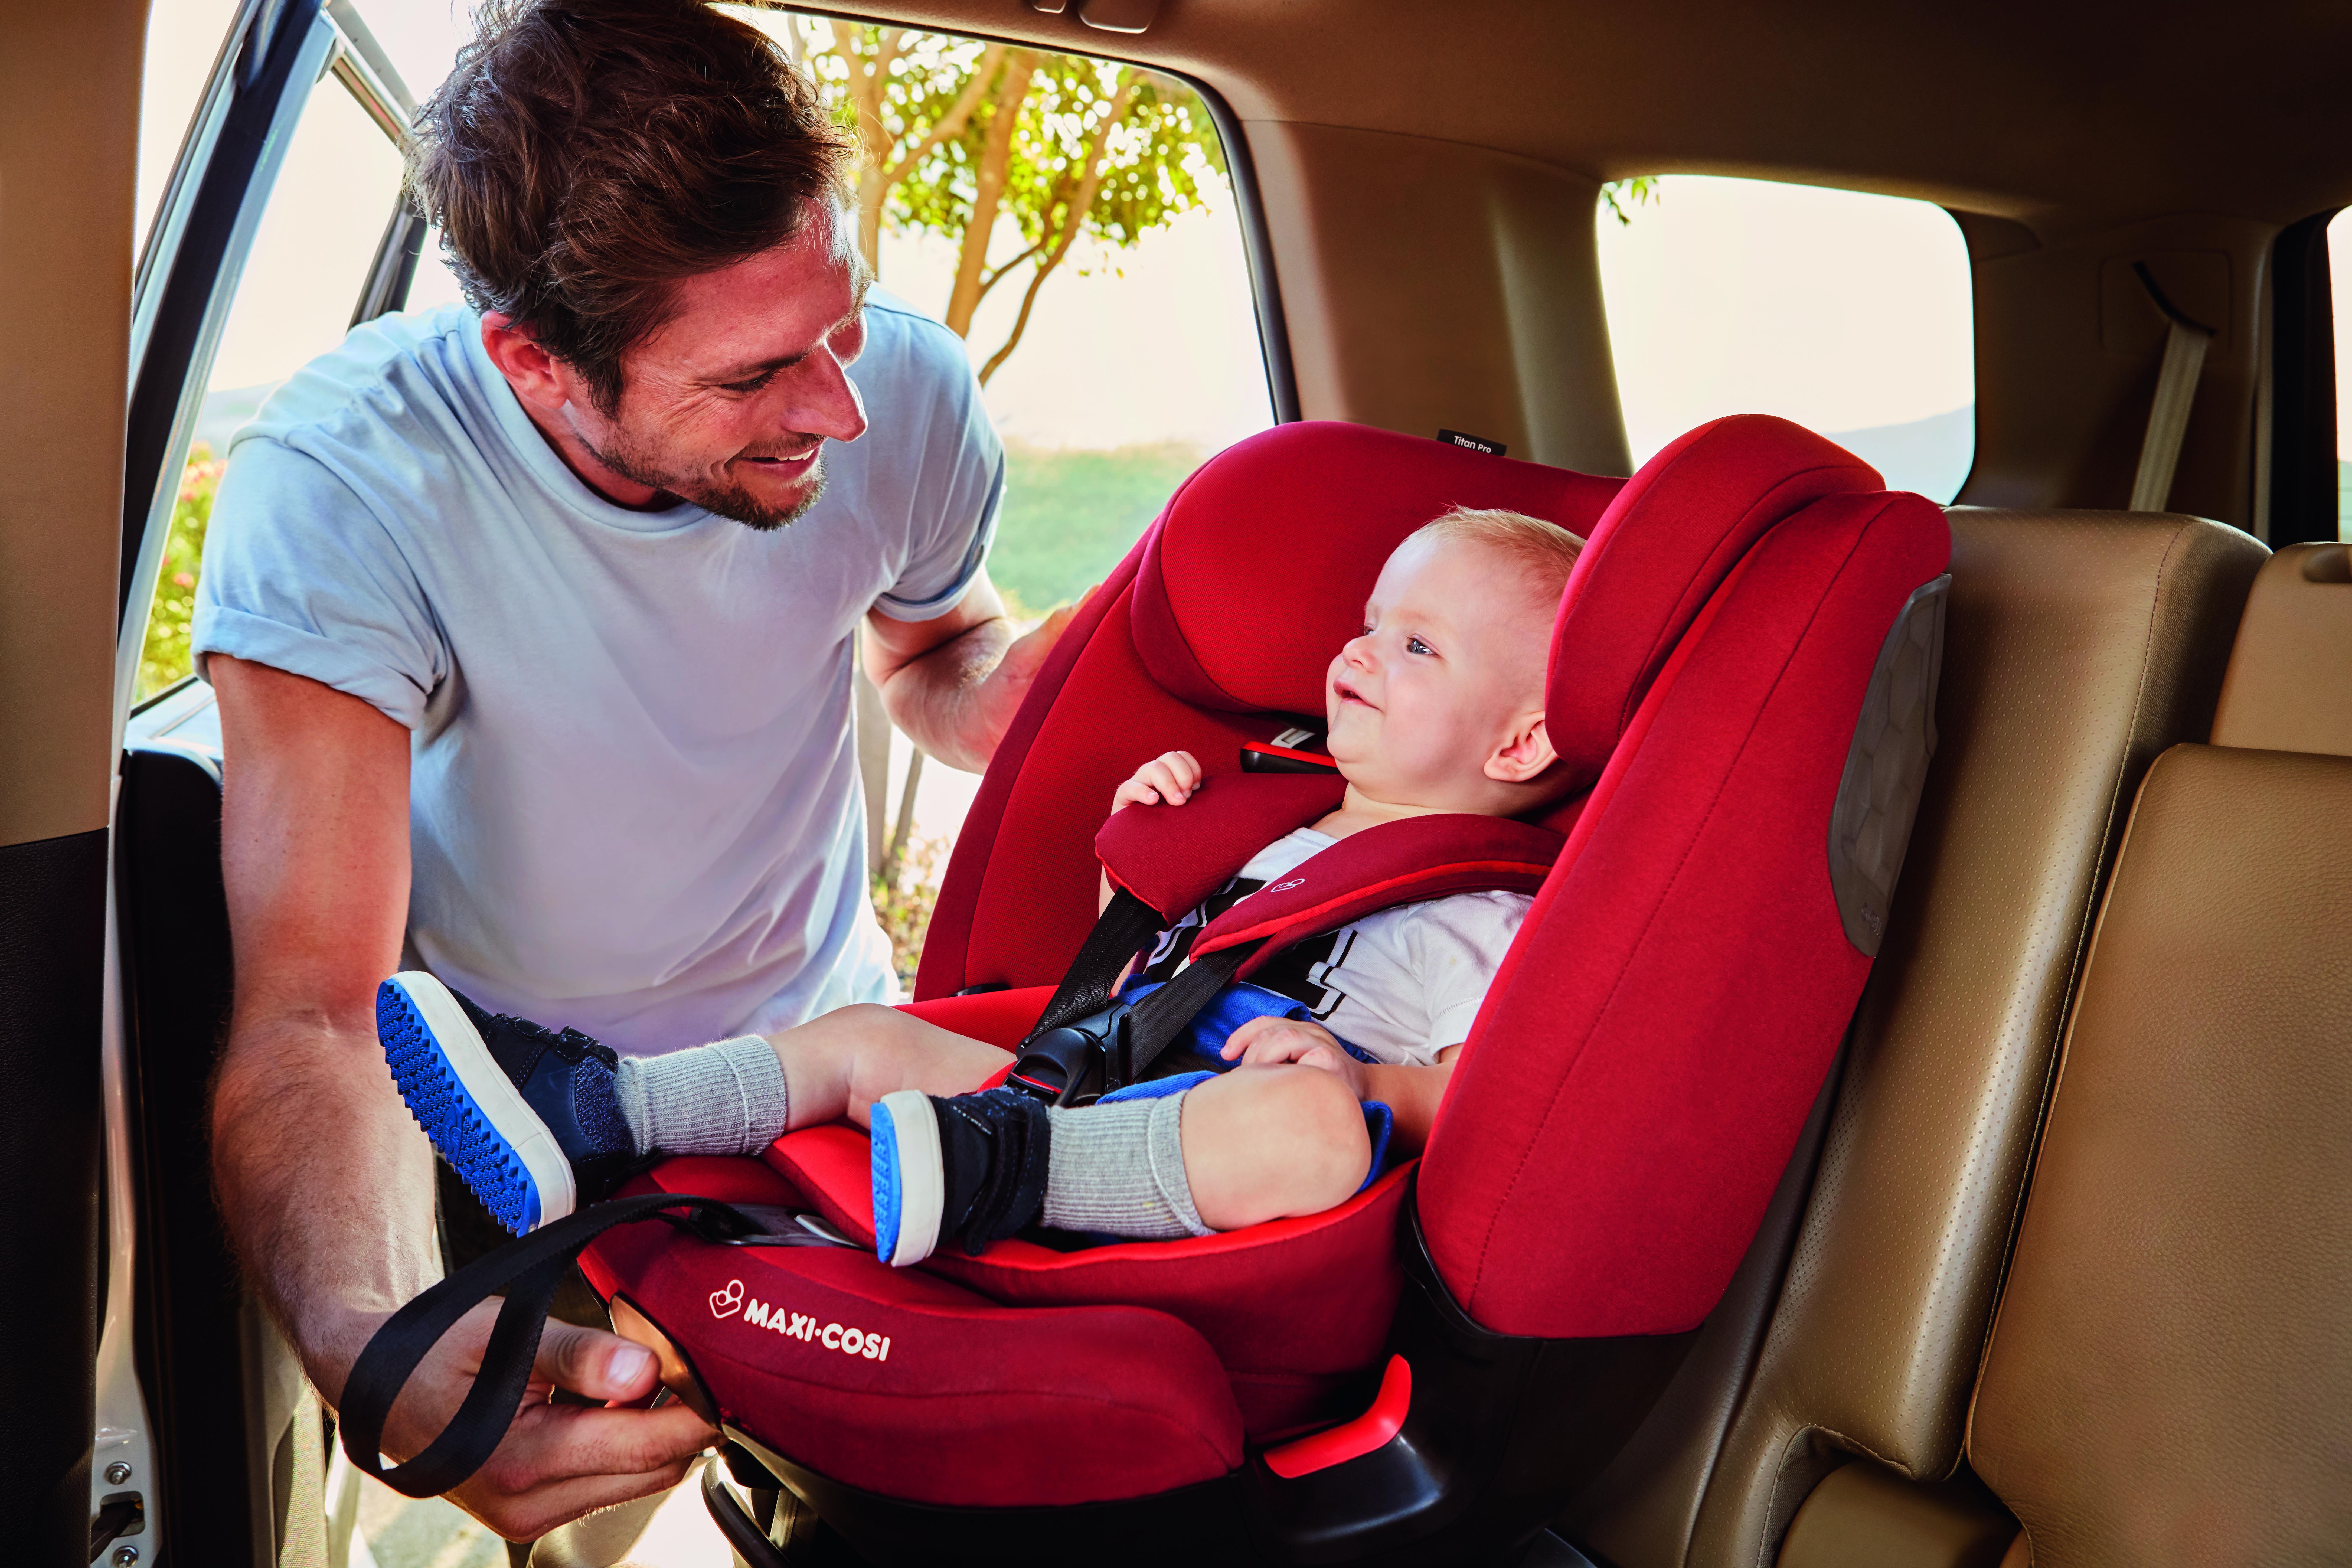 Titan Pro Toddler Child Car Seat Car Seats Child Car Seat Children